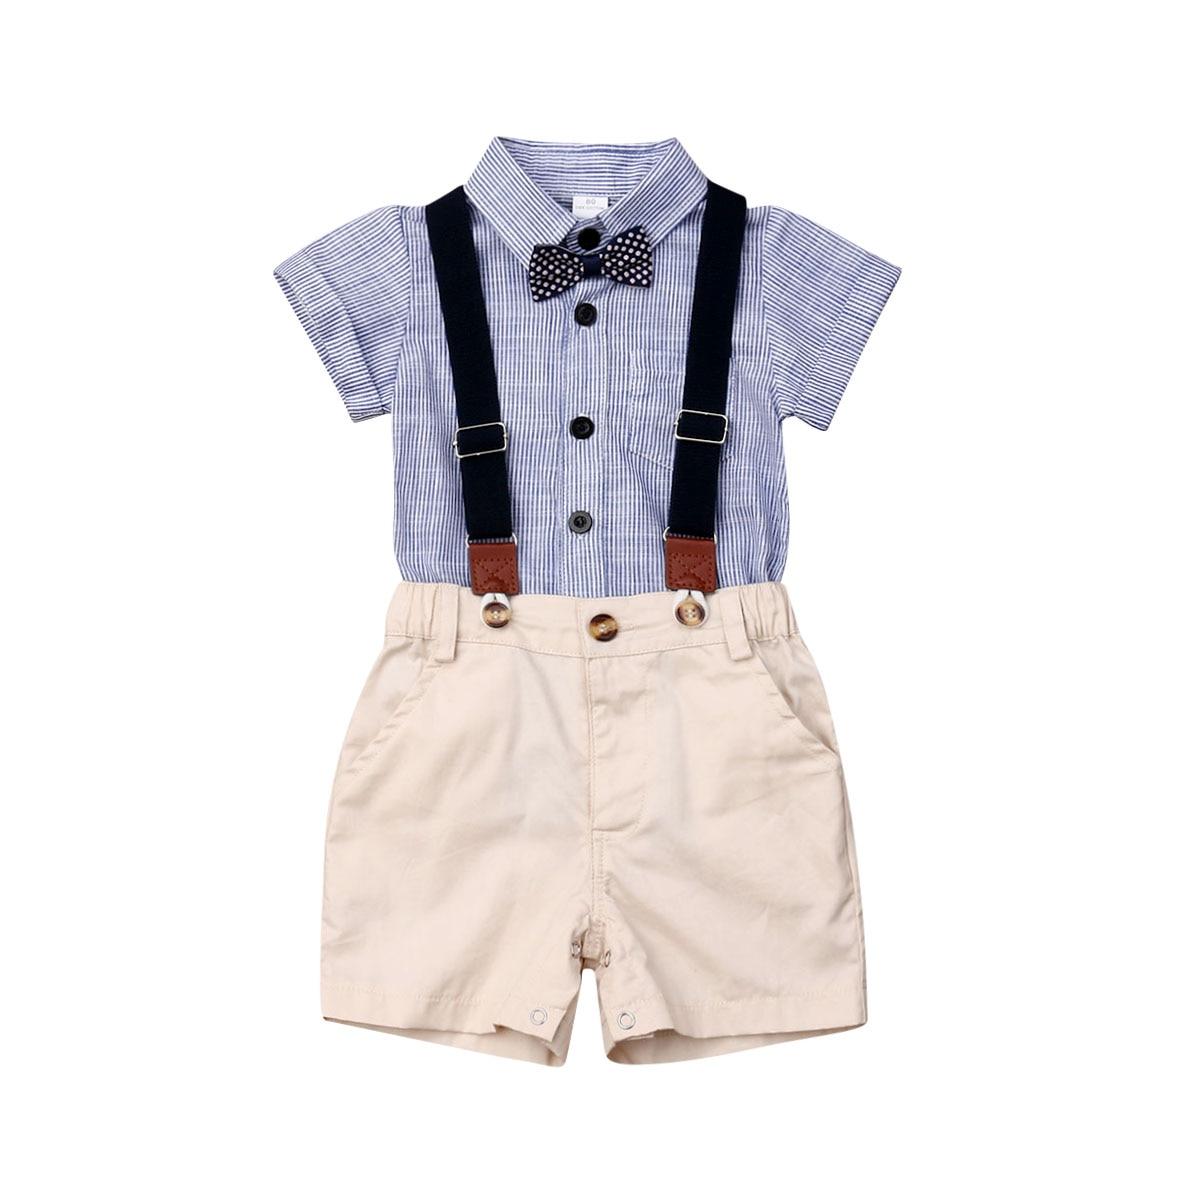 Beide Baby Boy Suit Gentleman Footed Romper With Bowtie